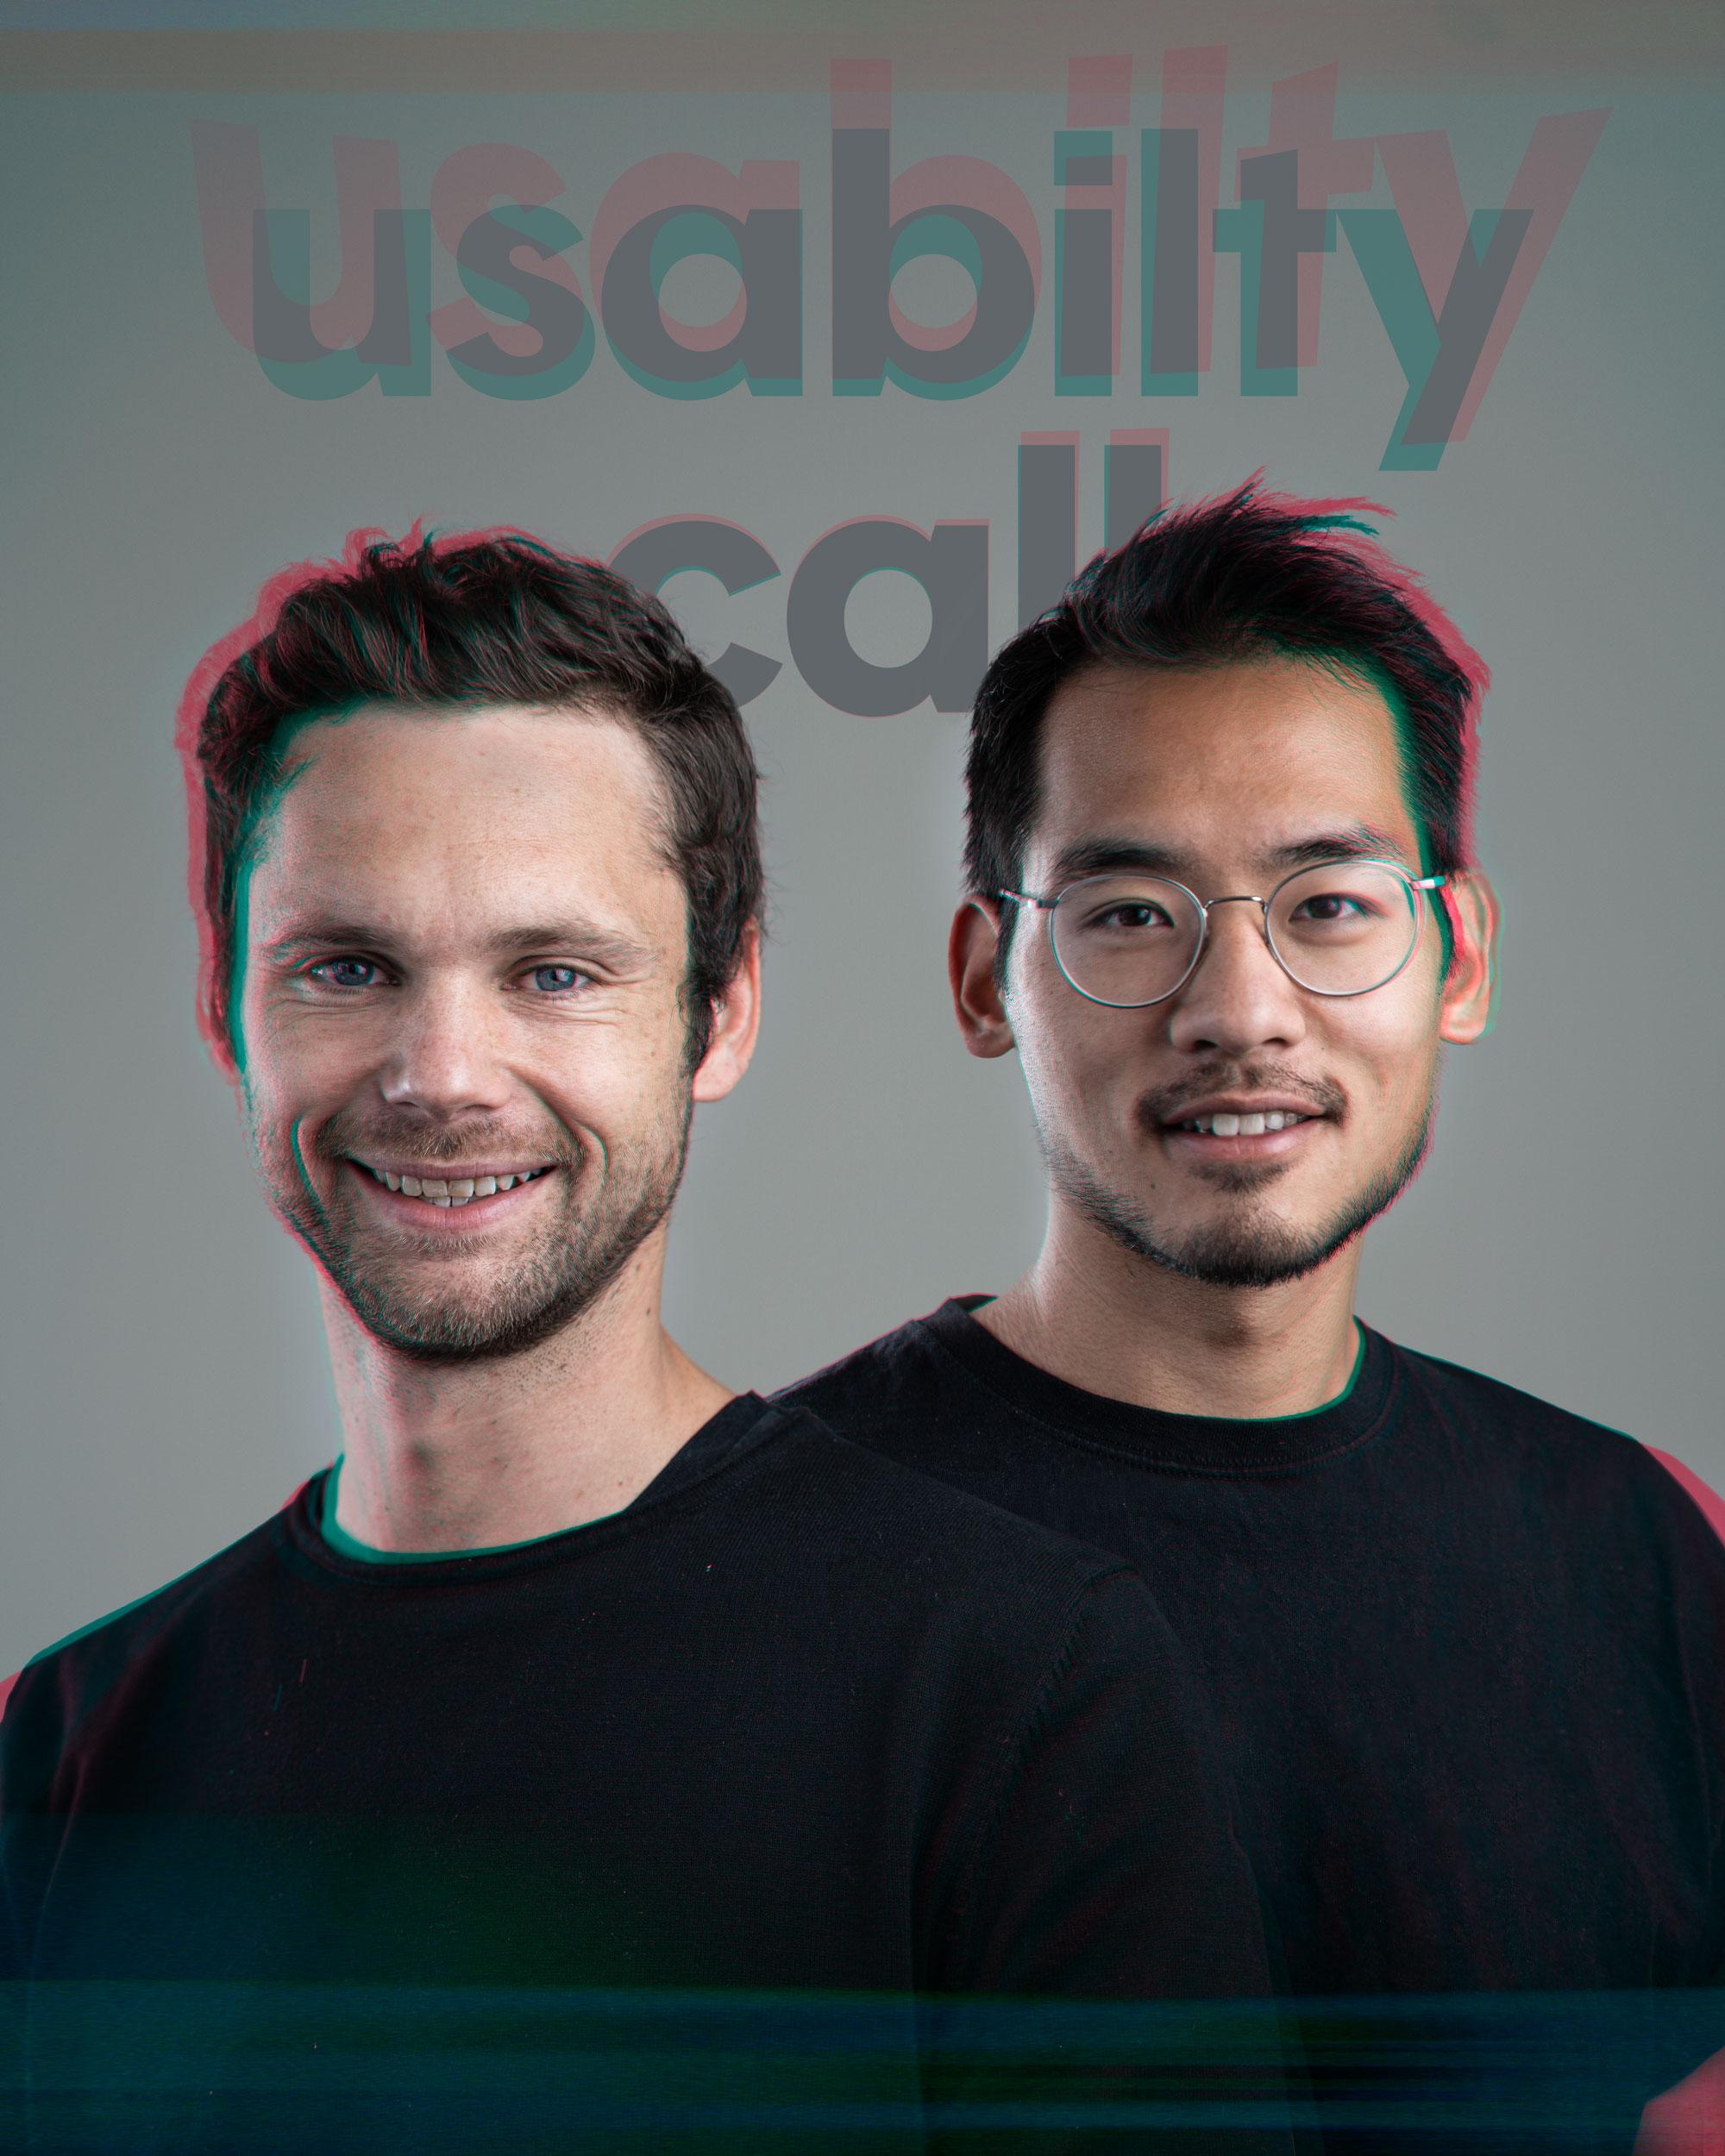 usability-call